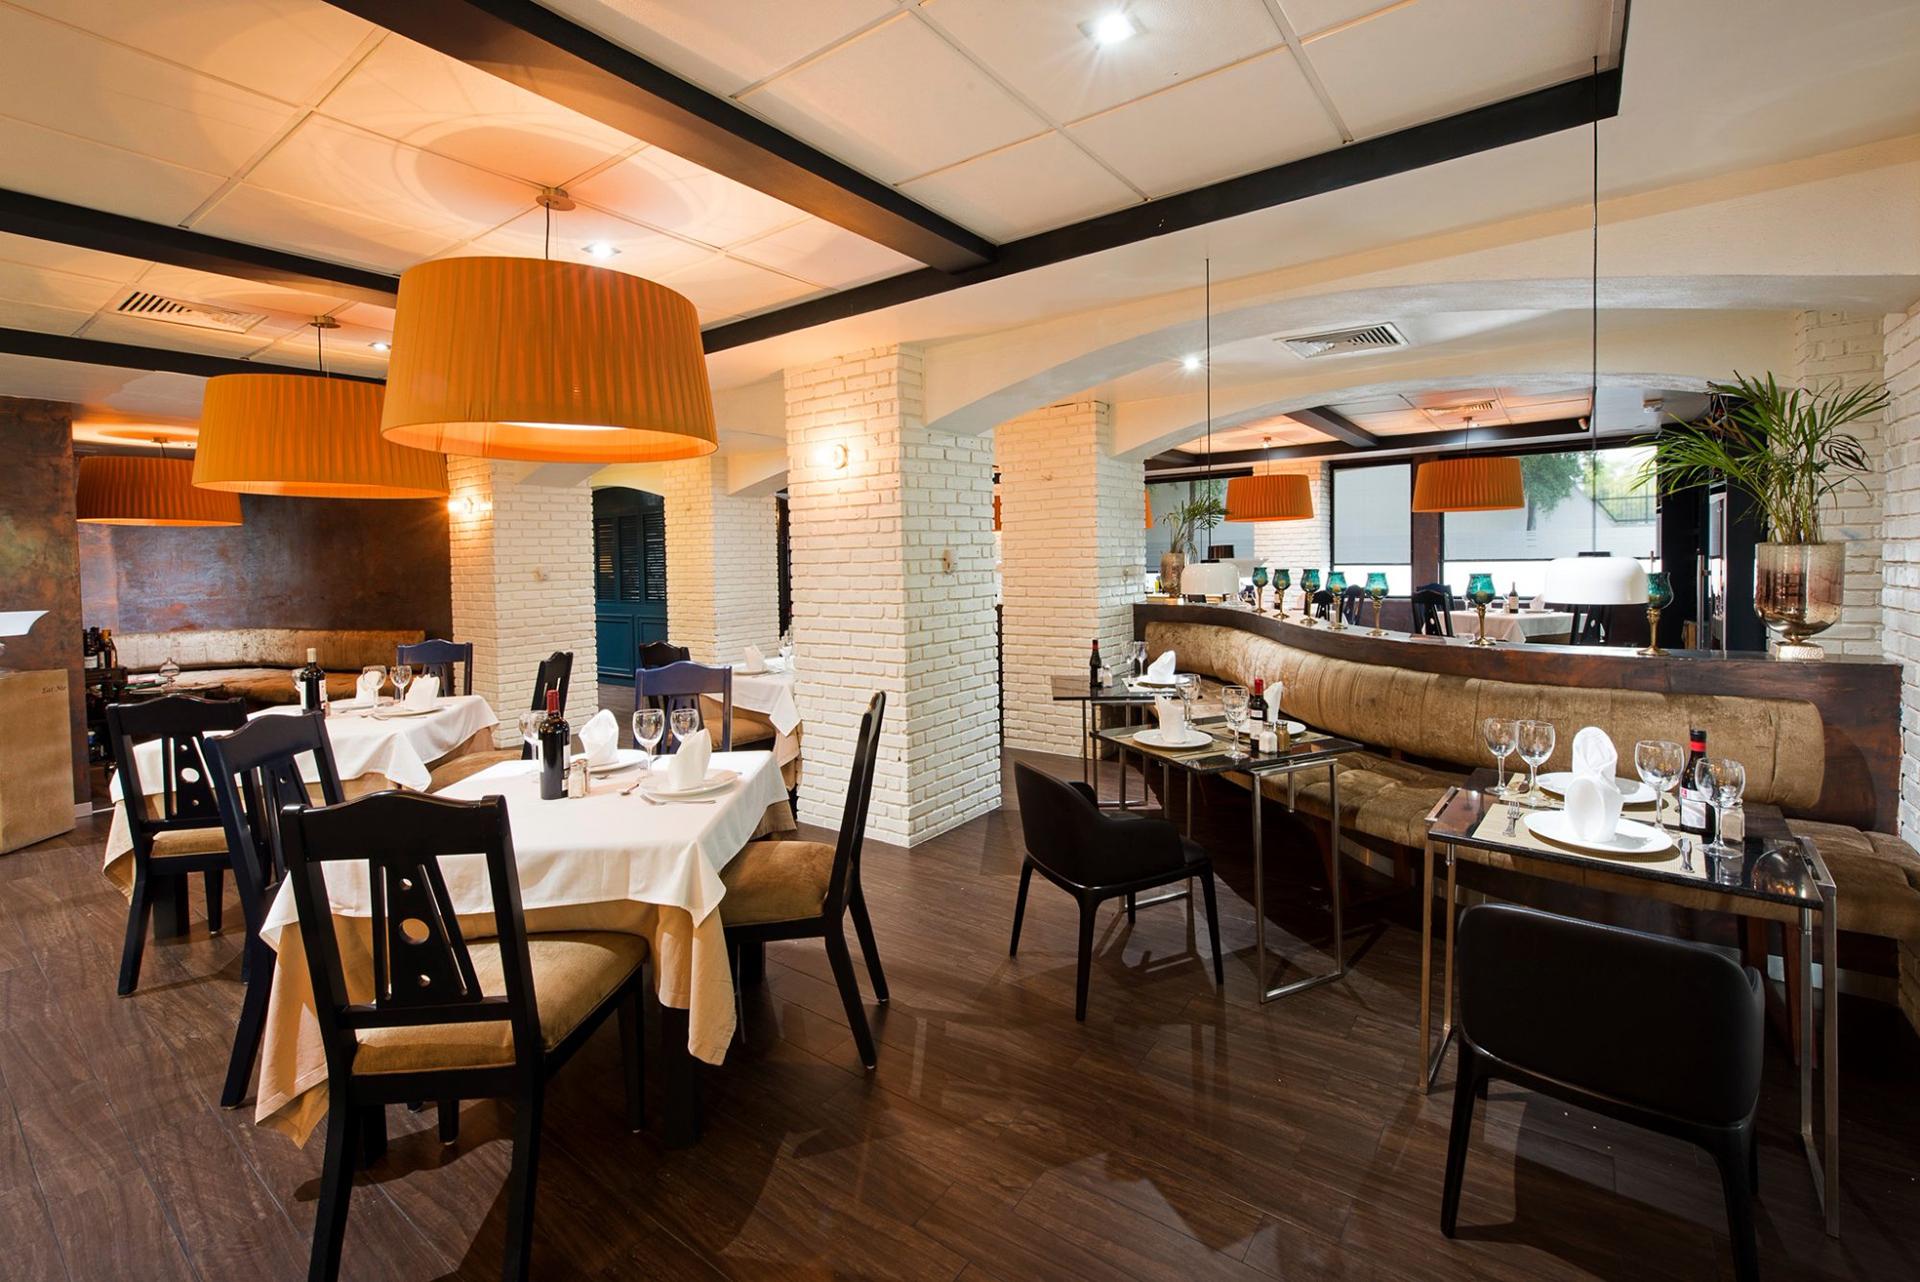 Restaurante Casa Vera Interior 01